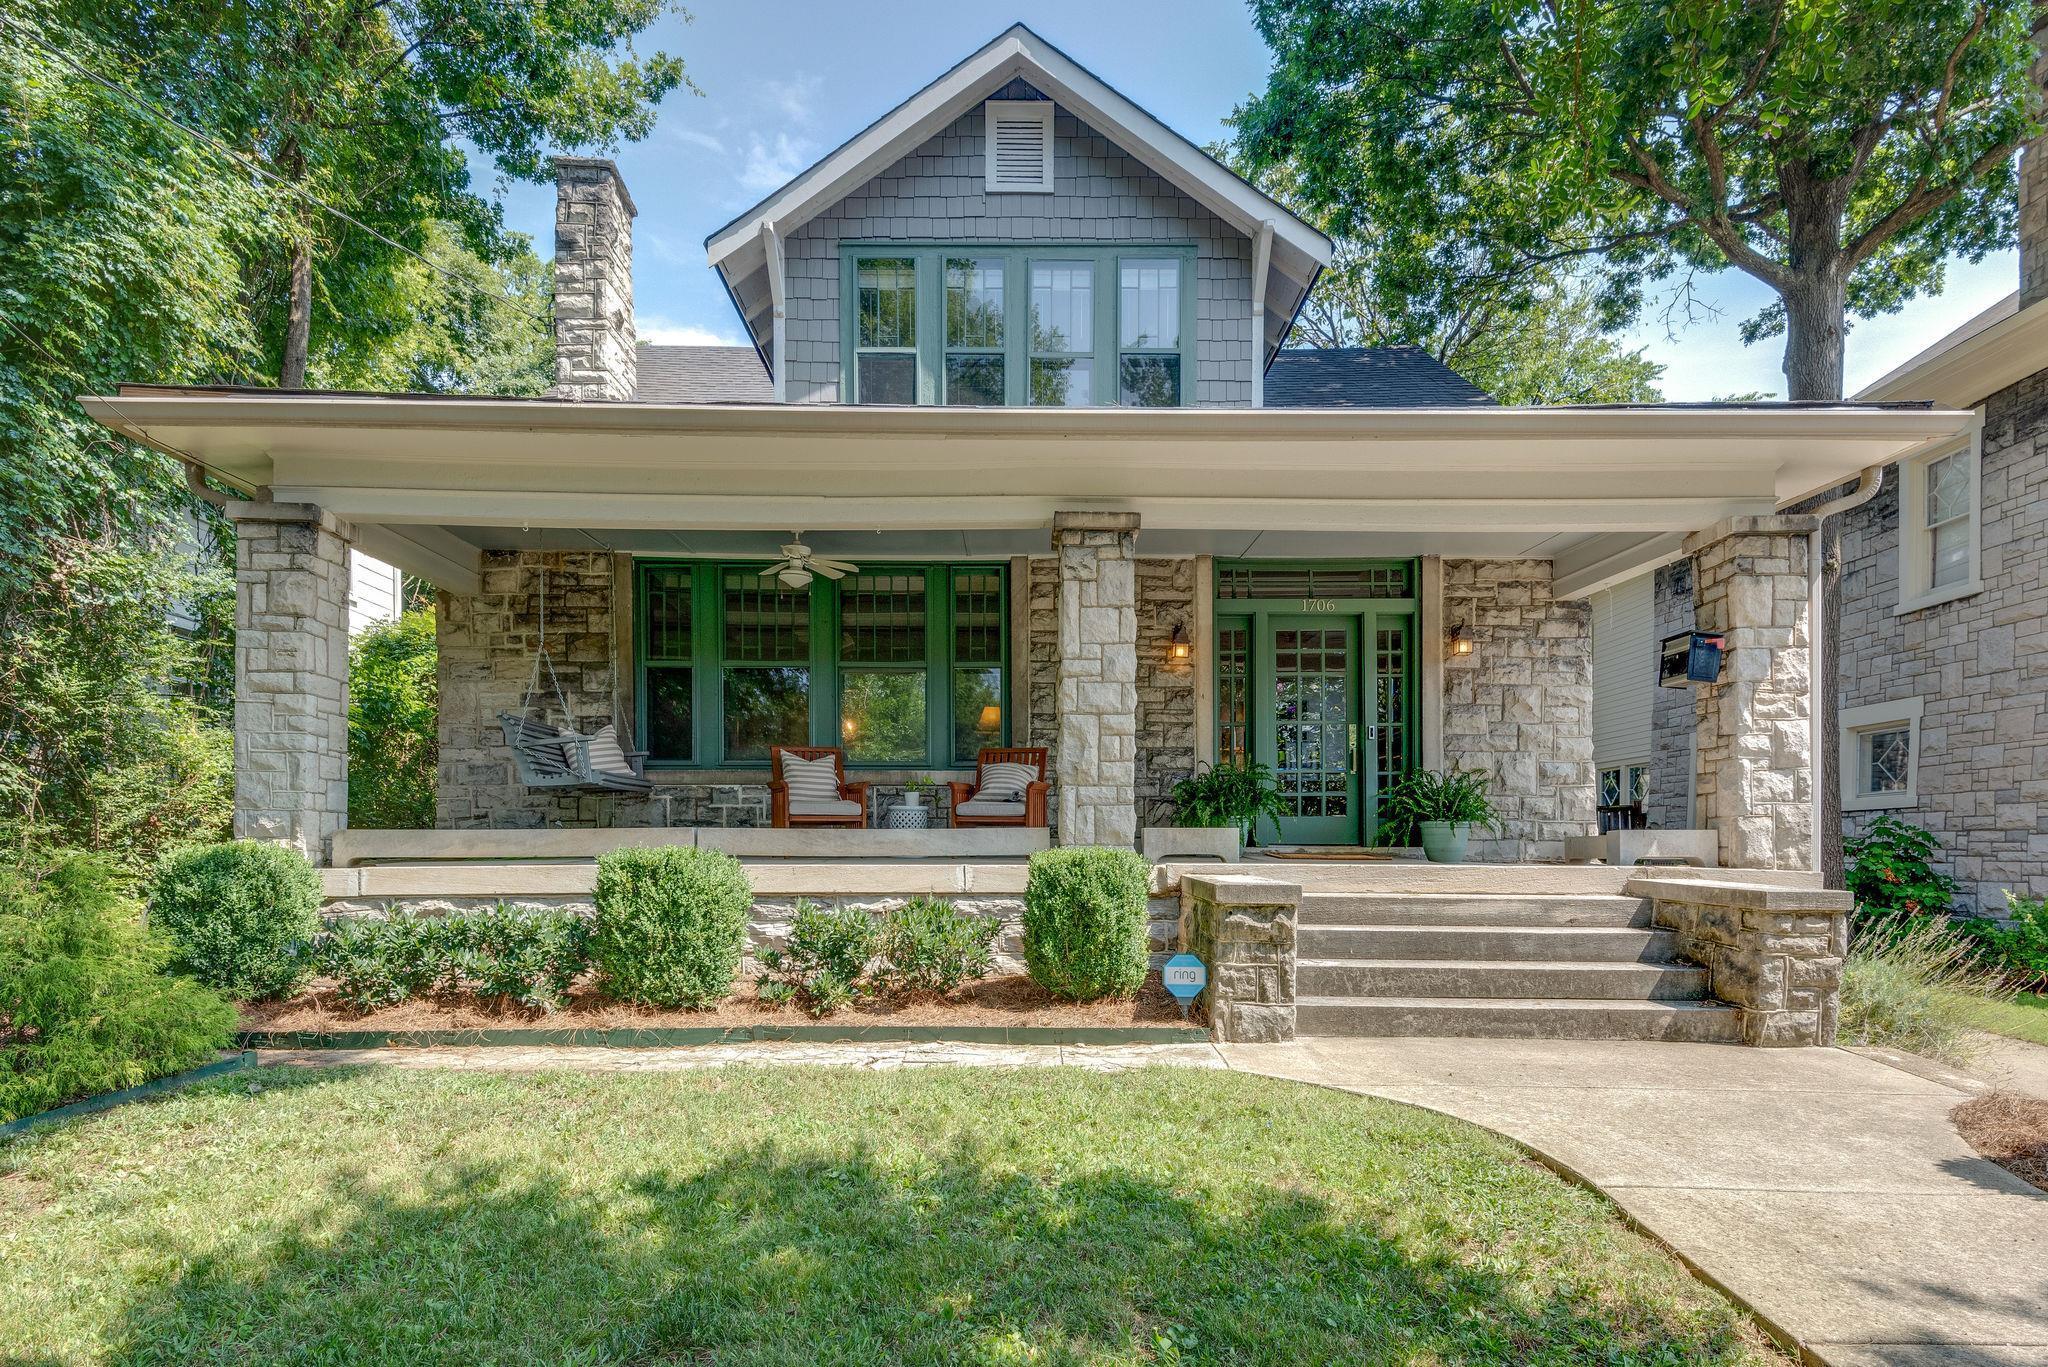 1706 Sweetbriar Ave, Nashville, TN 37212 - Nashville, TN real estate listing